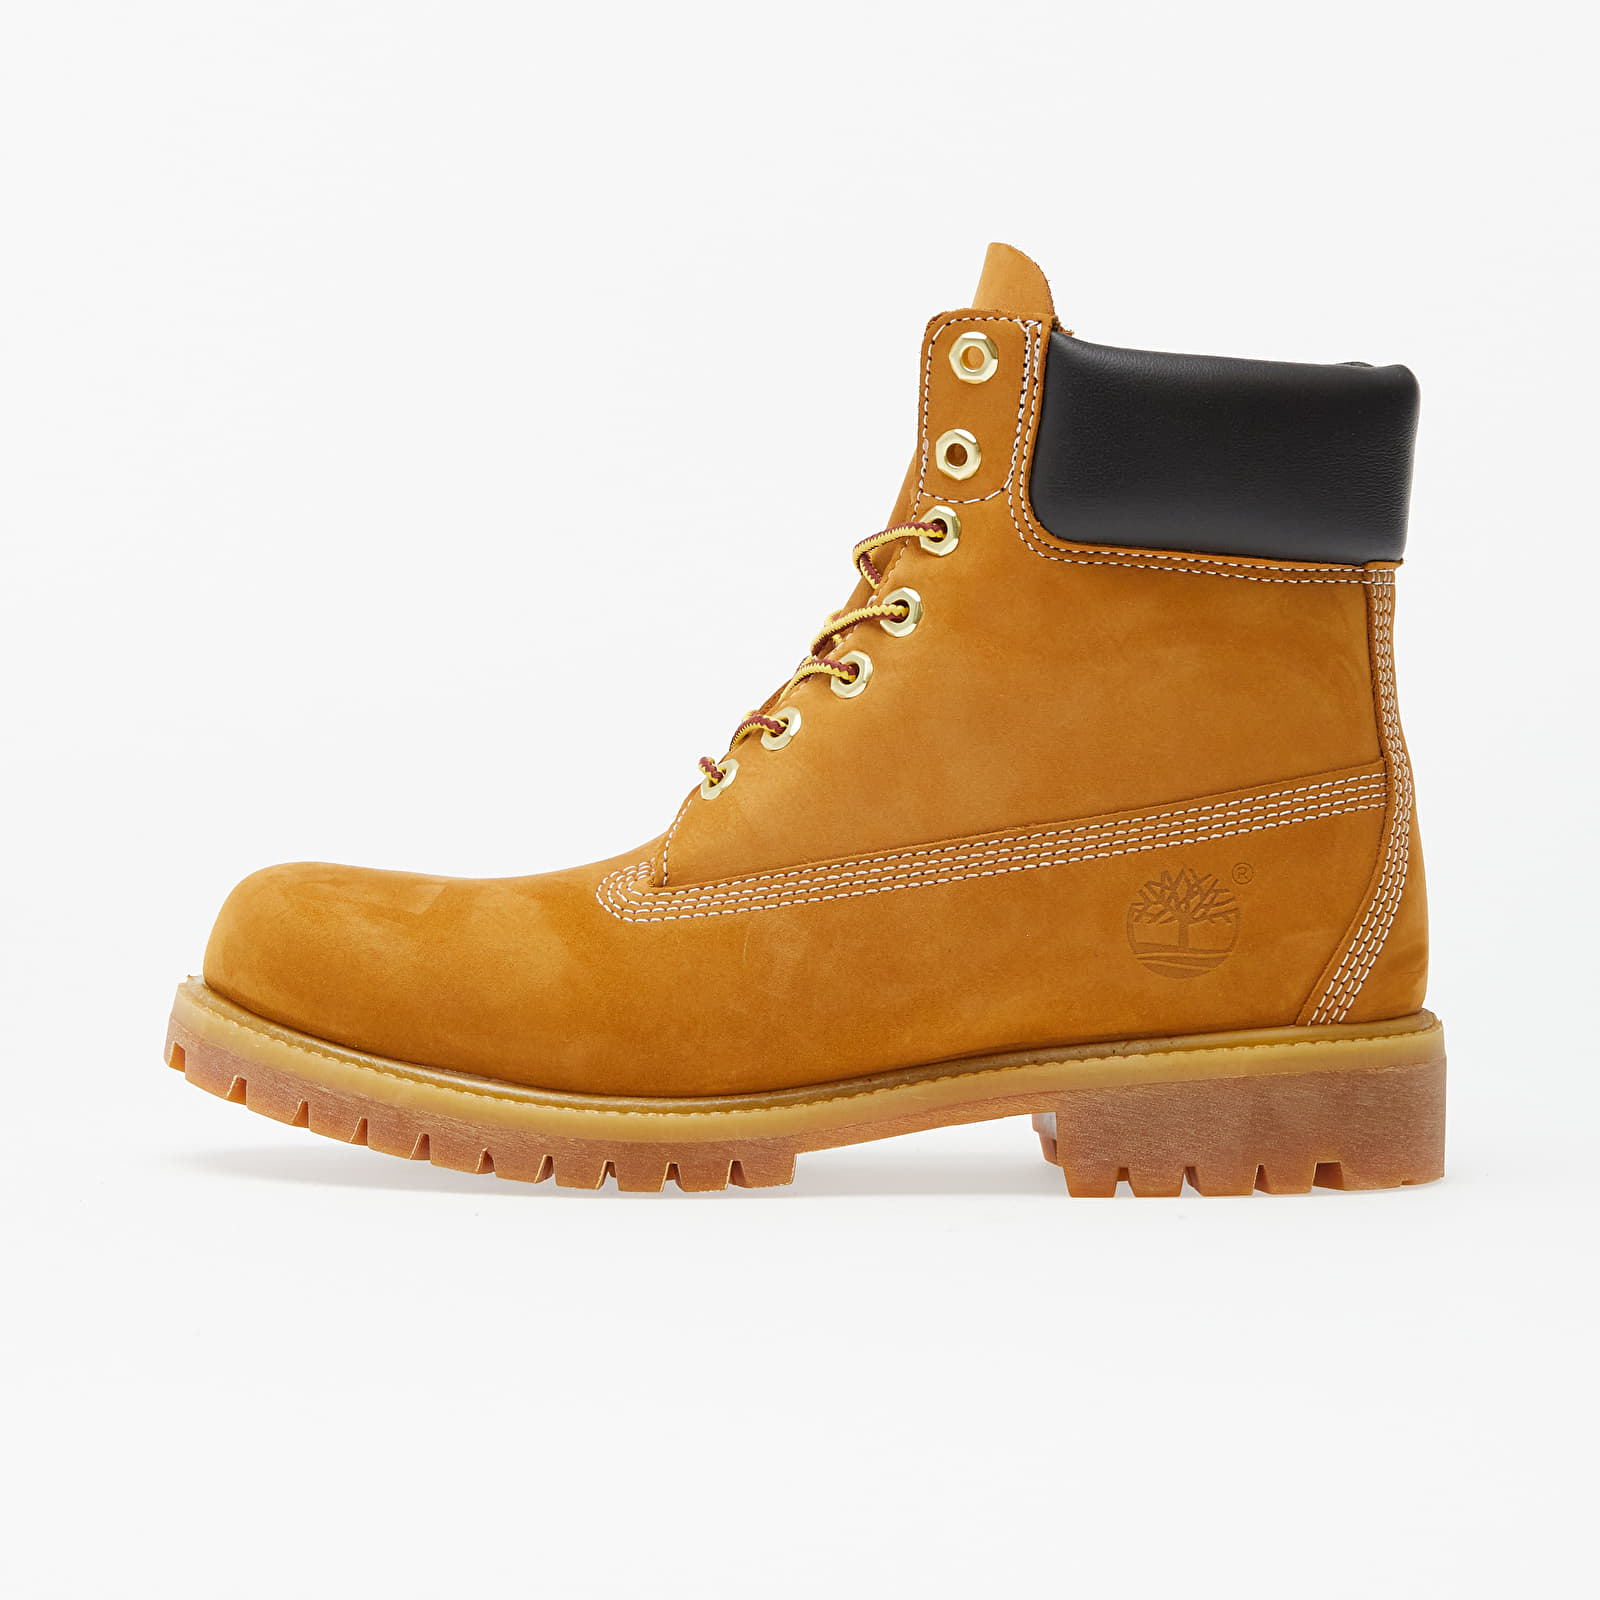 Timberland Premium 6 In Waterproof Boot Wheat Nubuck EUR 44.5